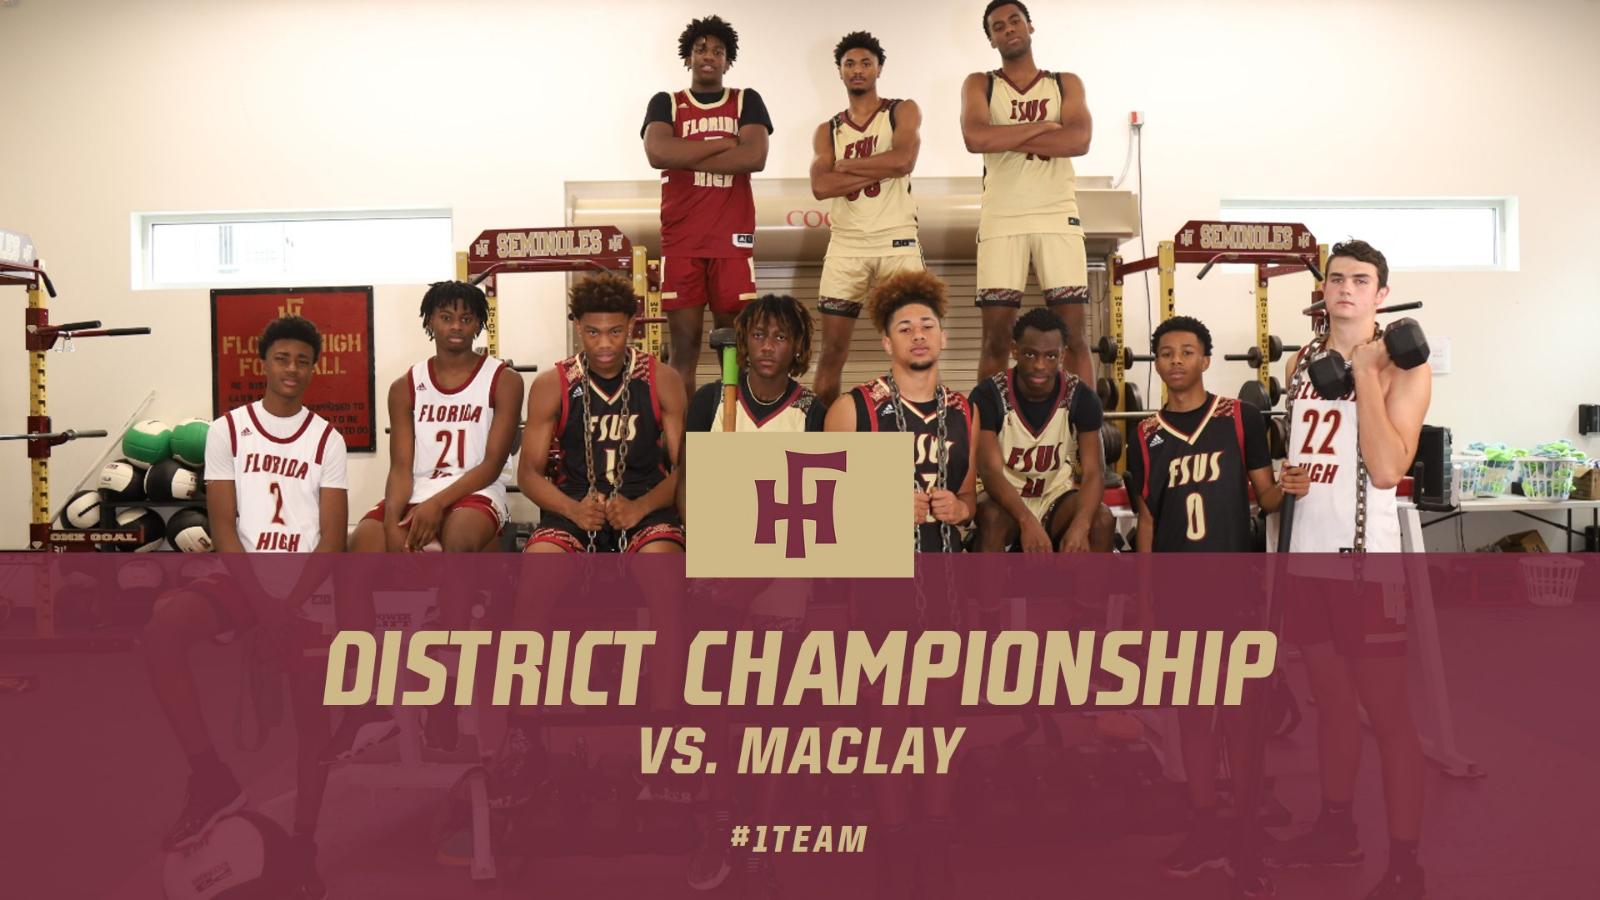 Boys Basketball District Championship Tickets